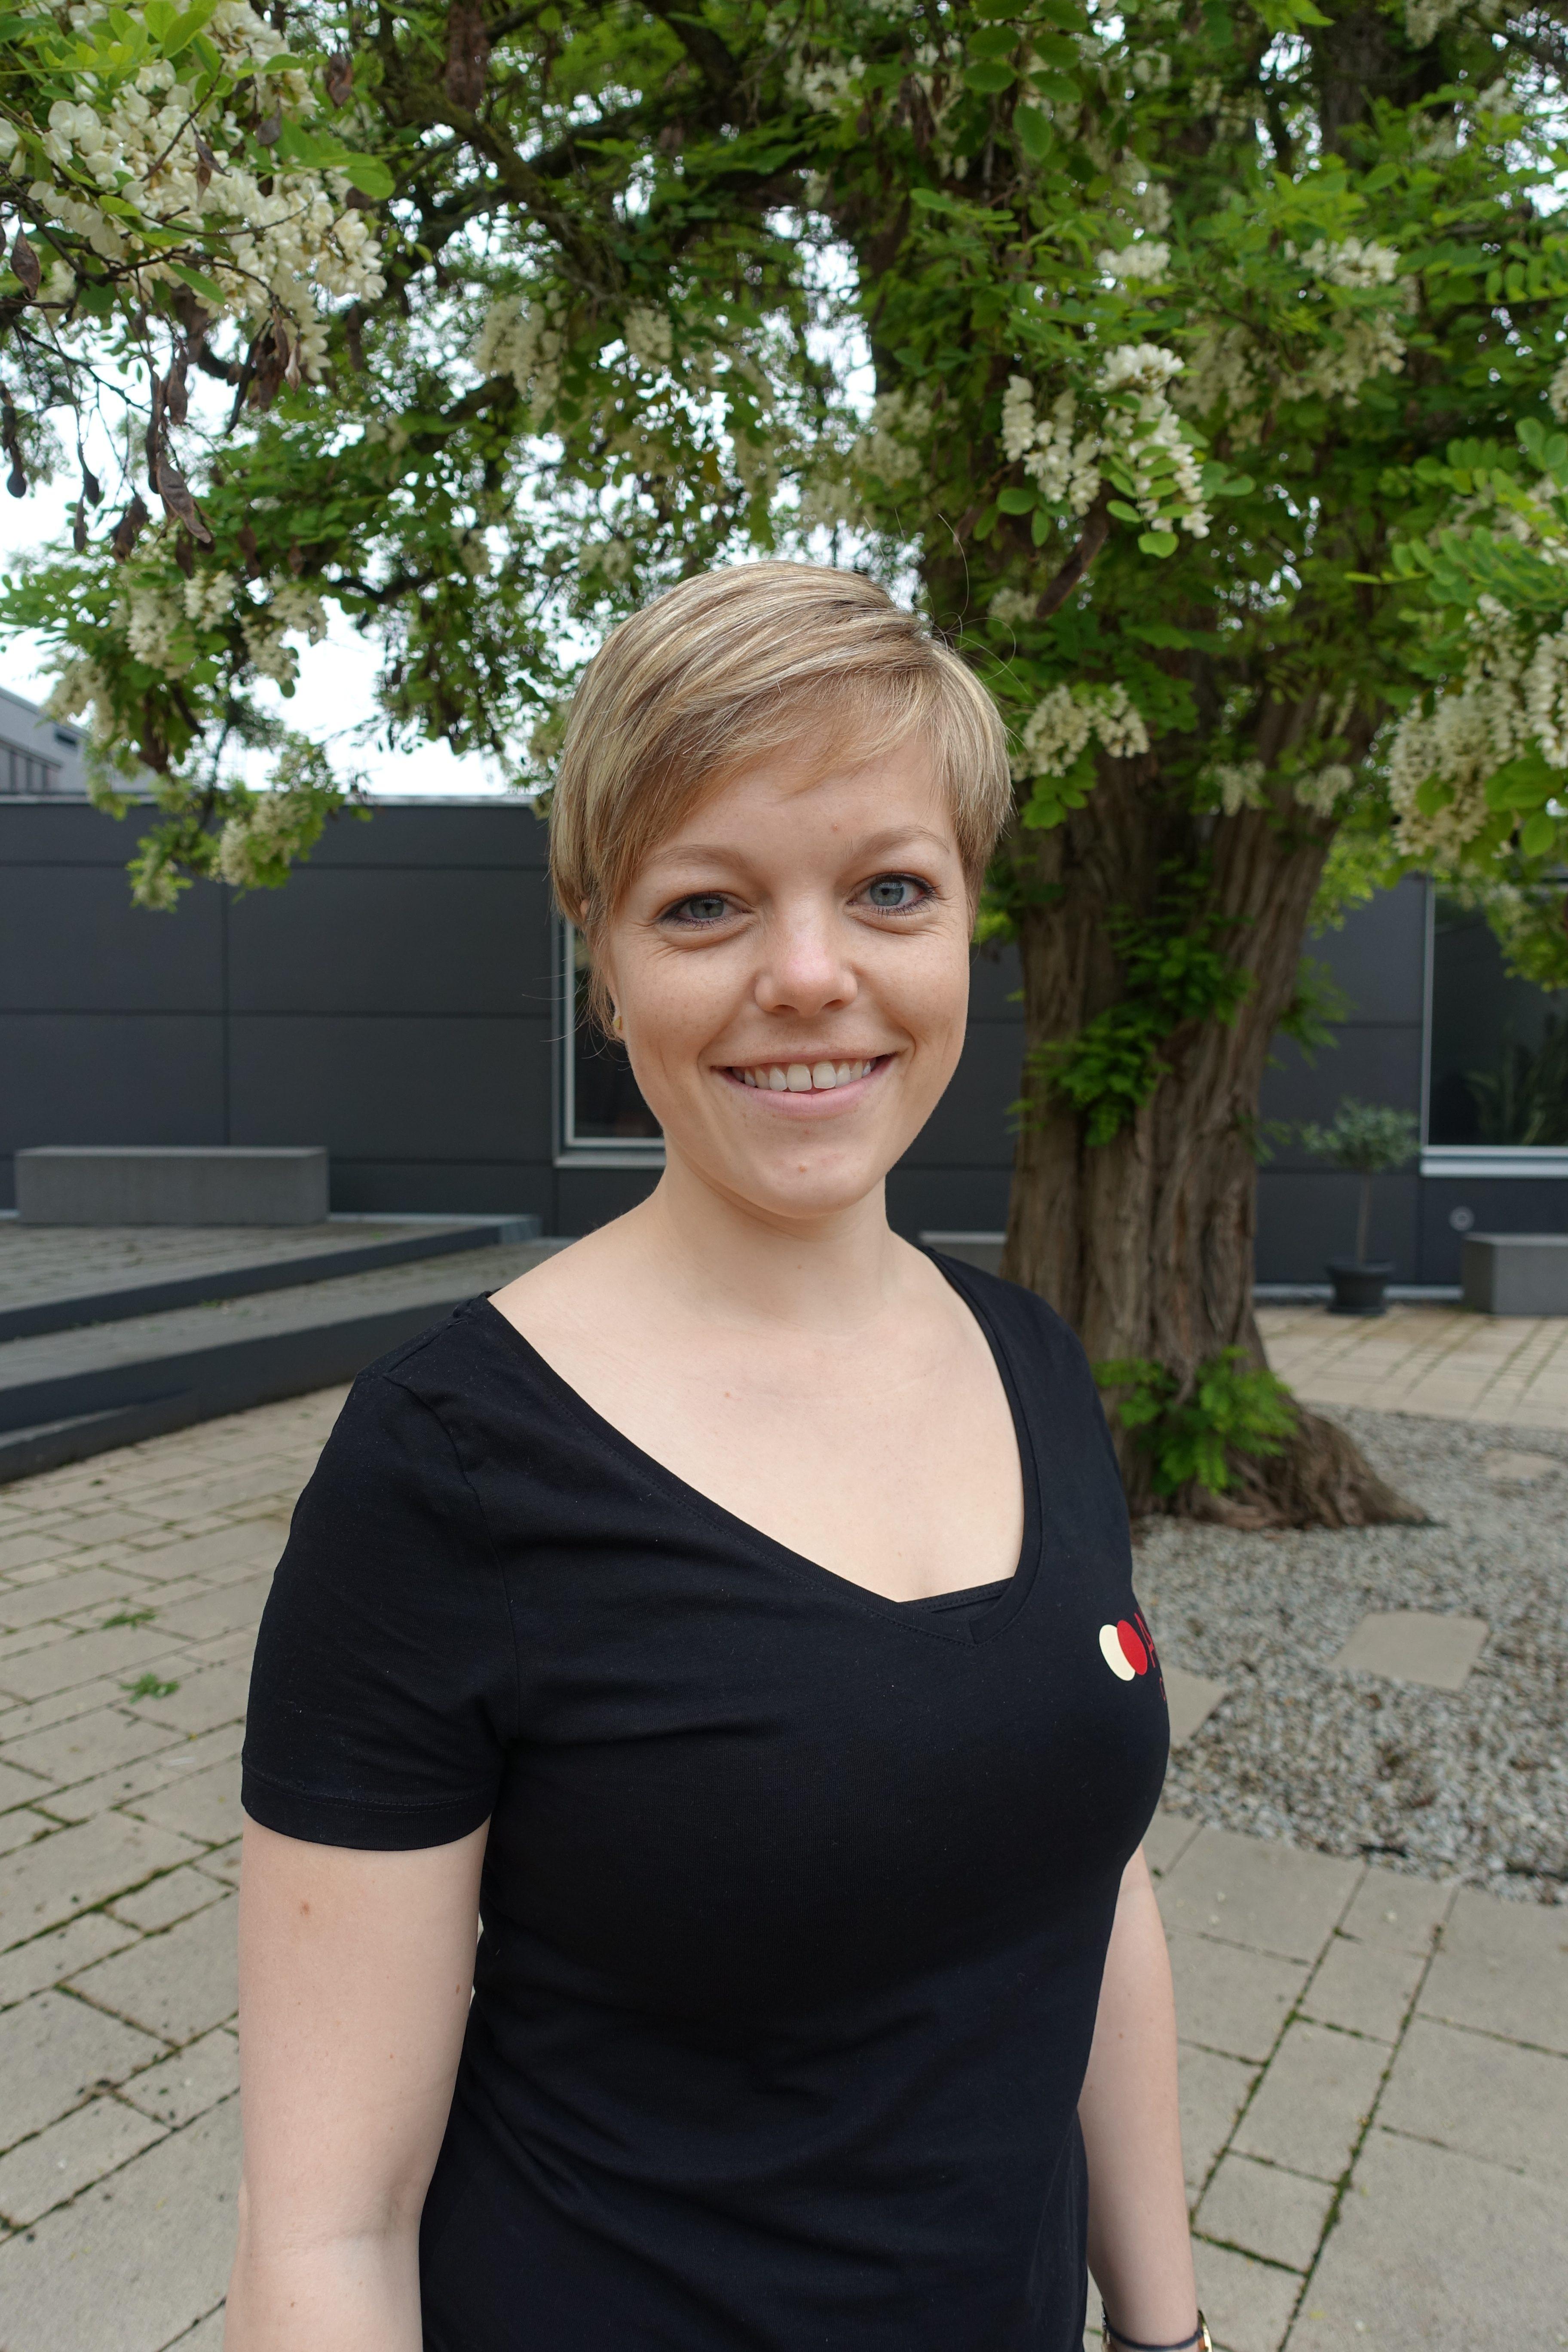 Helena Unkelbach